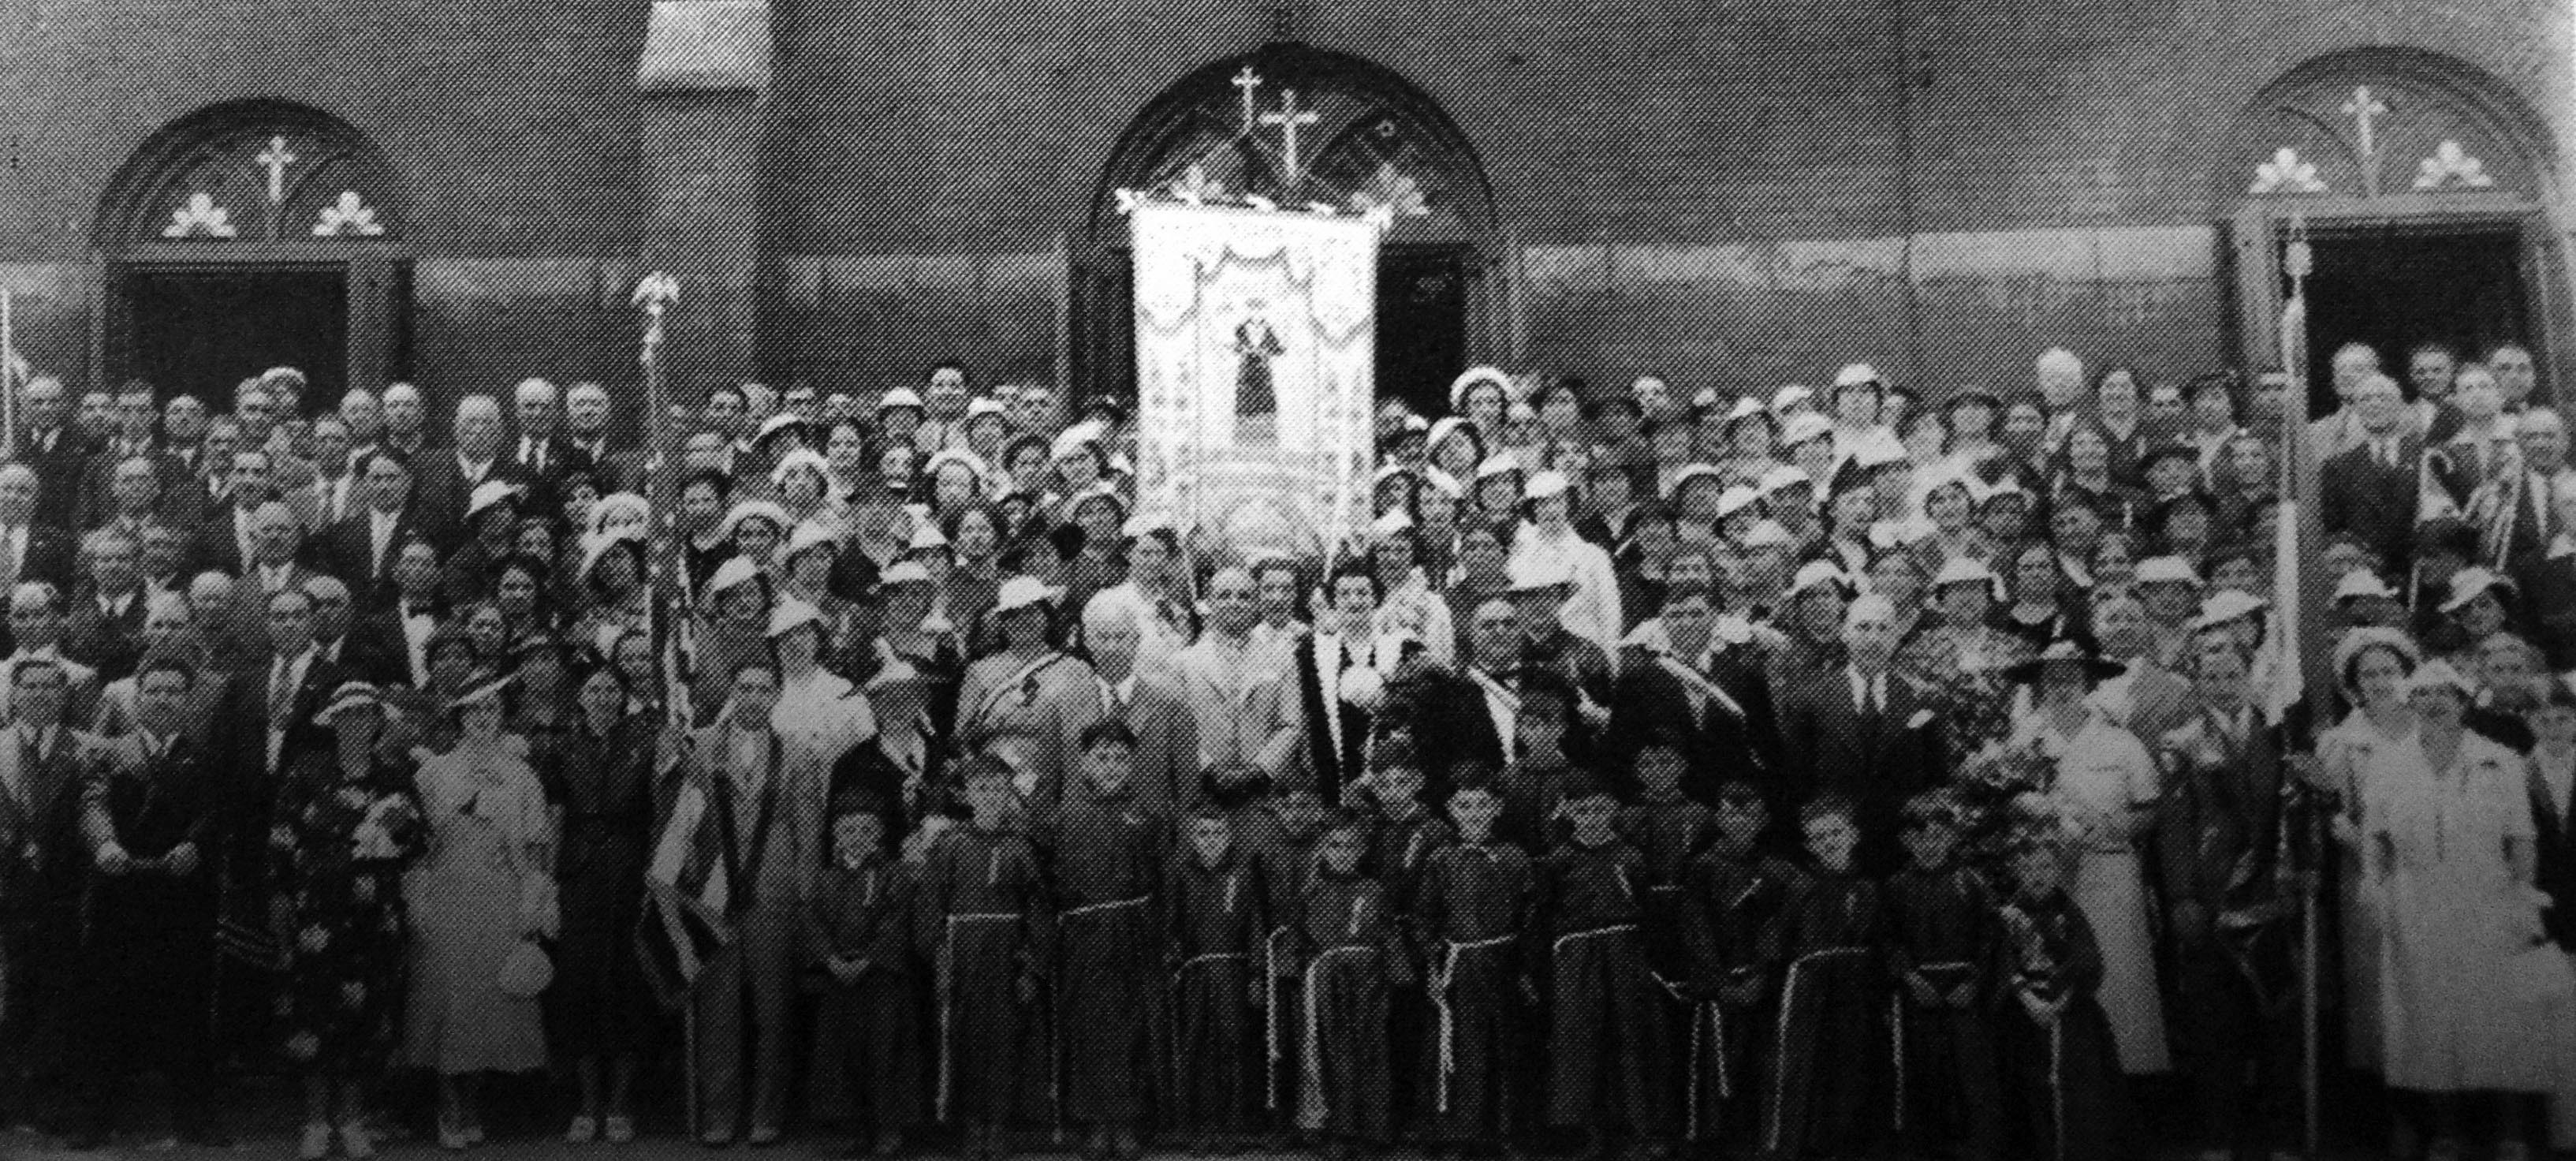 SOCIETA NICASTRESE 1937